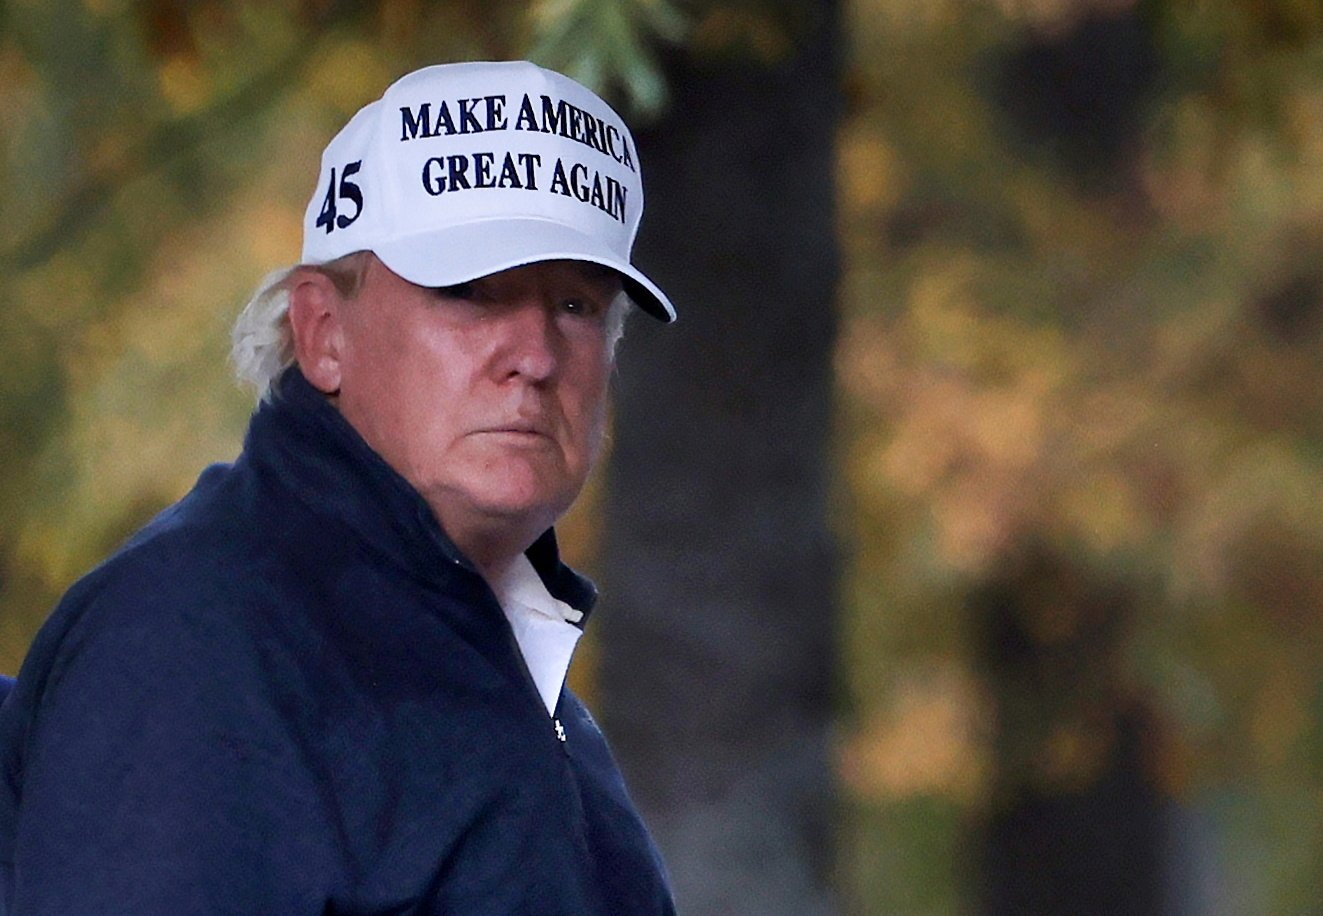 U.S President Donald Trump returns to the White House, Washington, D.C., U.S., Nov. 7, 2020. (REUTERS Photo)